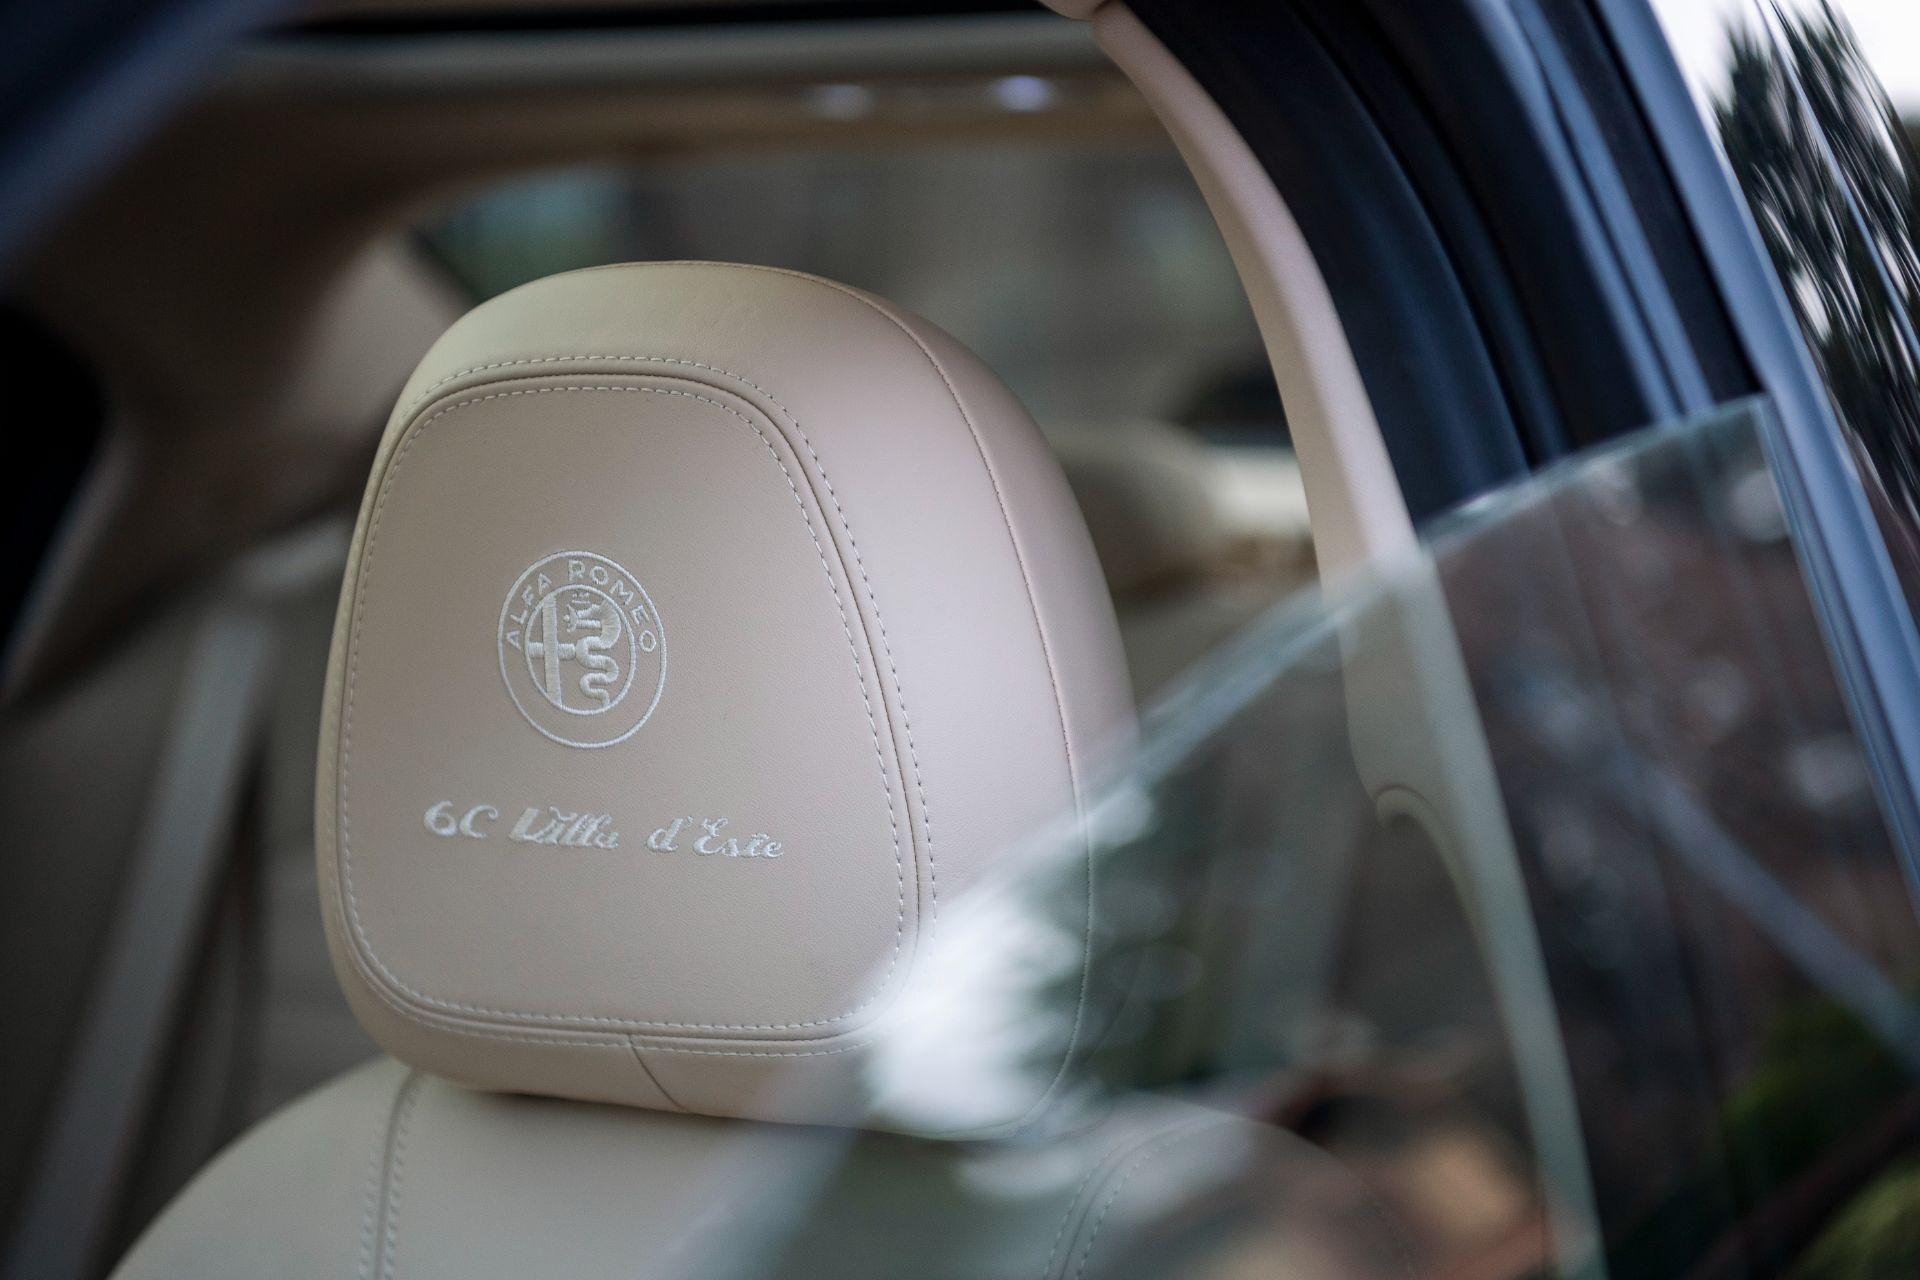 Alfa-Romeo-Giulia-and-Stelvio-6C-Villa-dEste-11